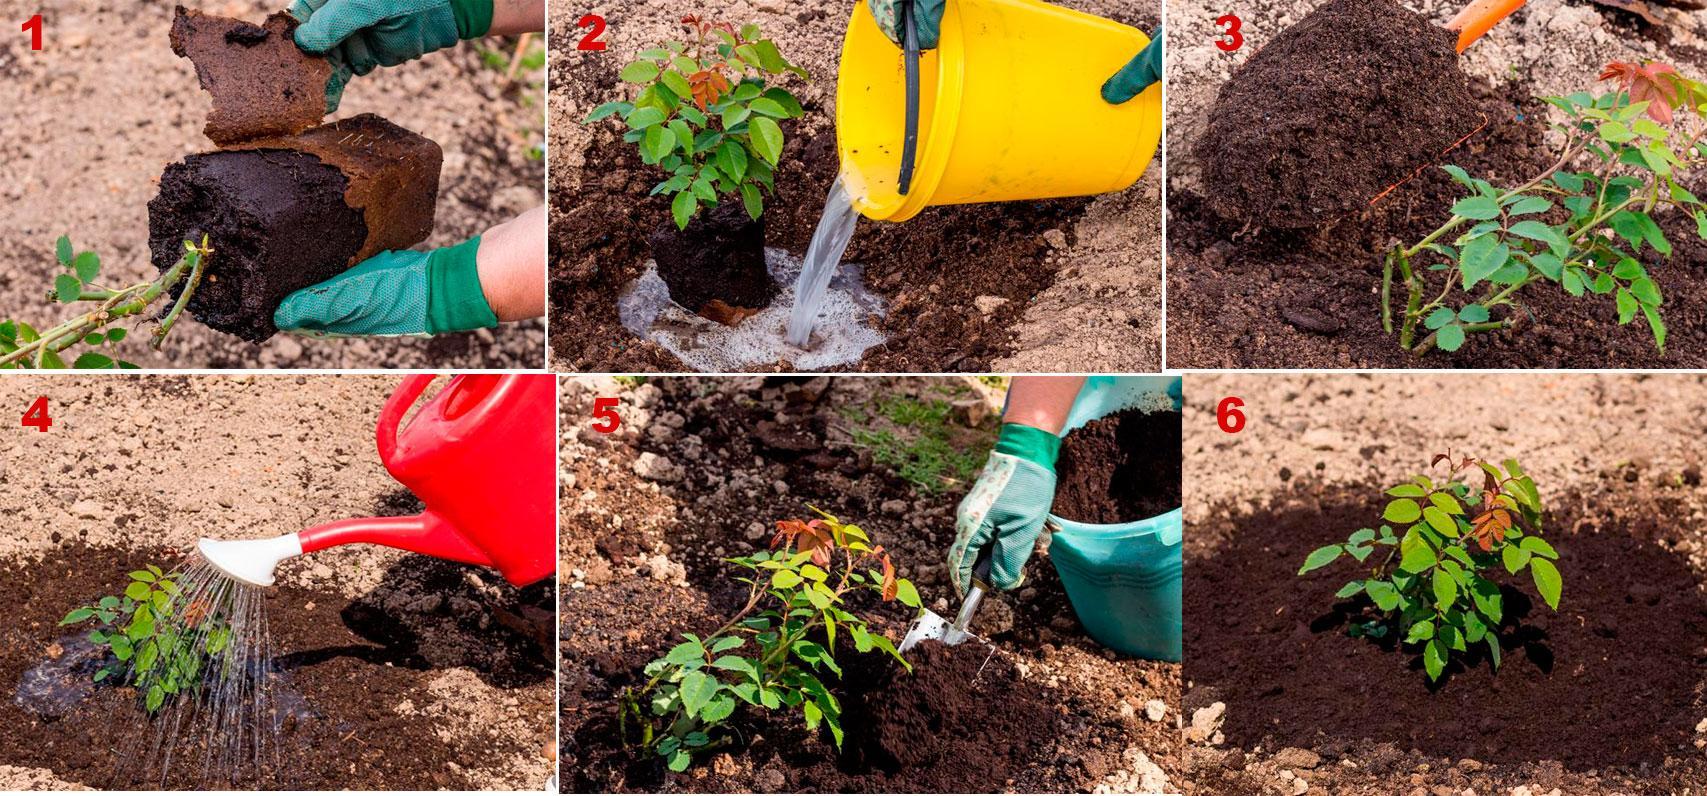 Этапы посадки саженца розы